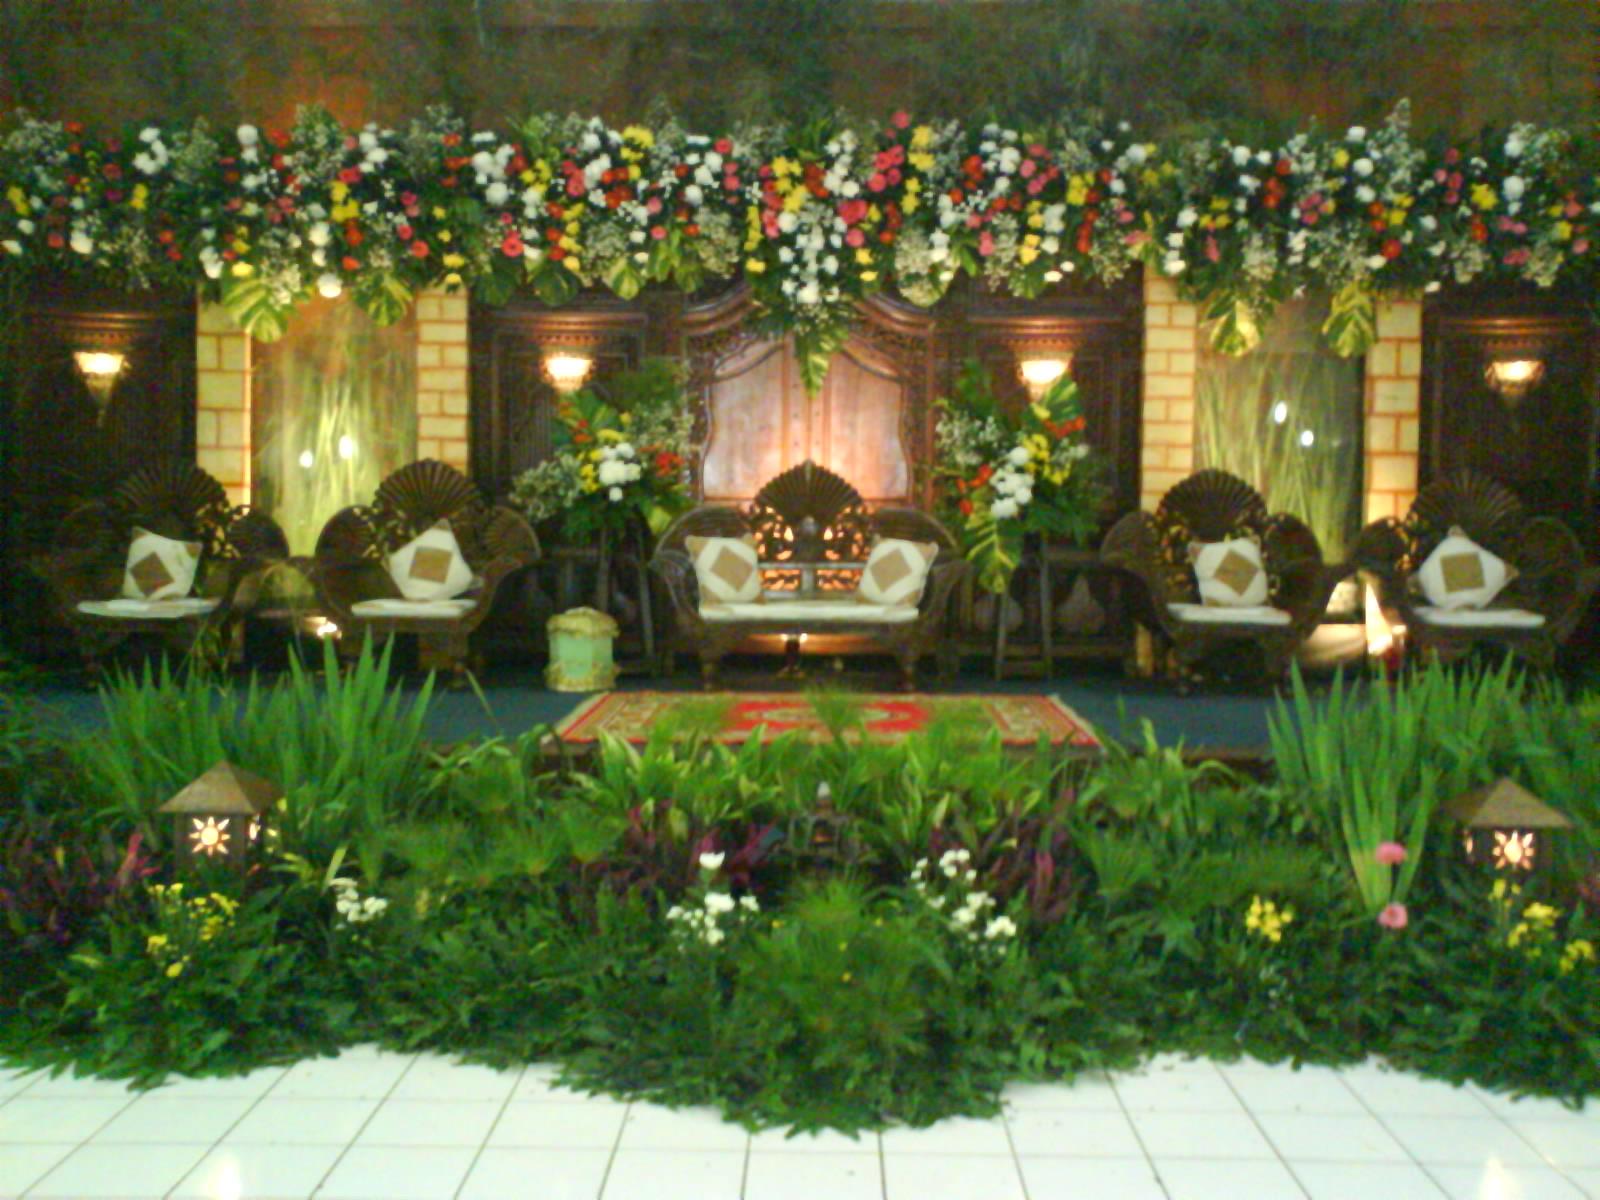 Fall Feather Wallpaper Tyricka S Blog Outdoor Indian Wedding